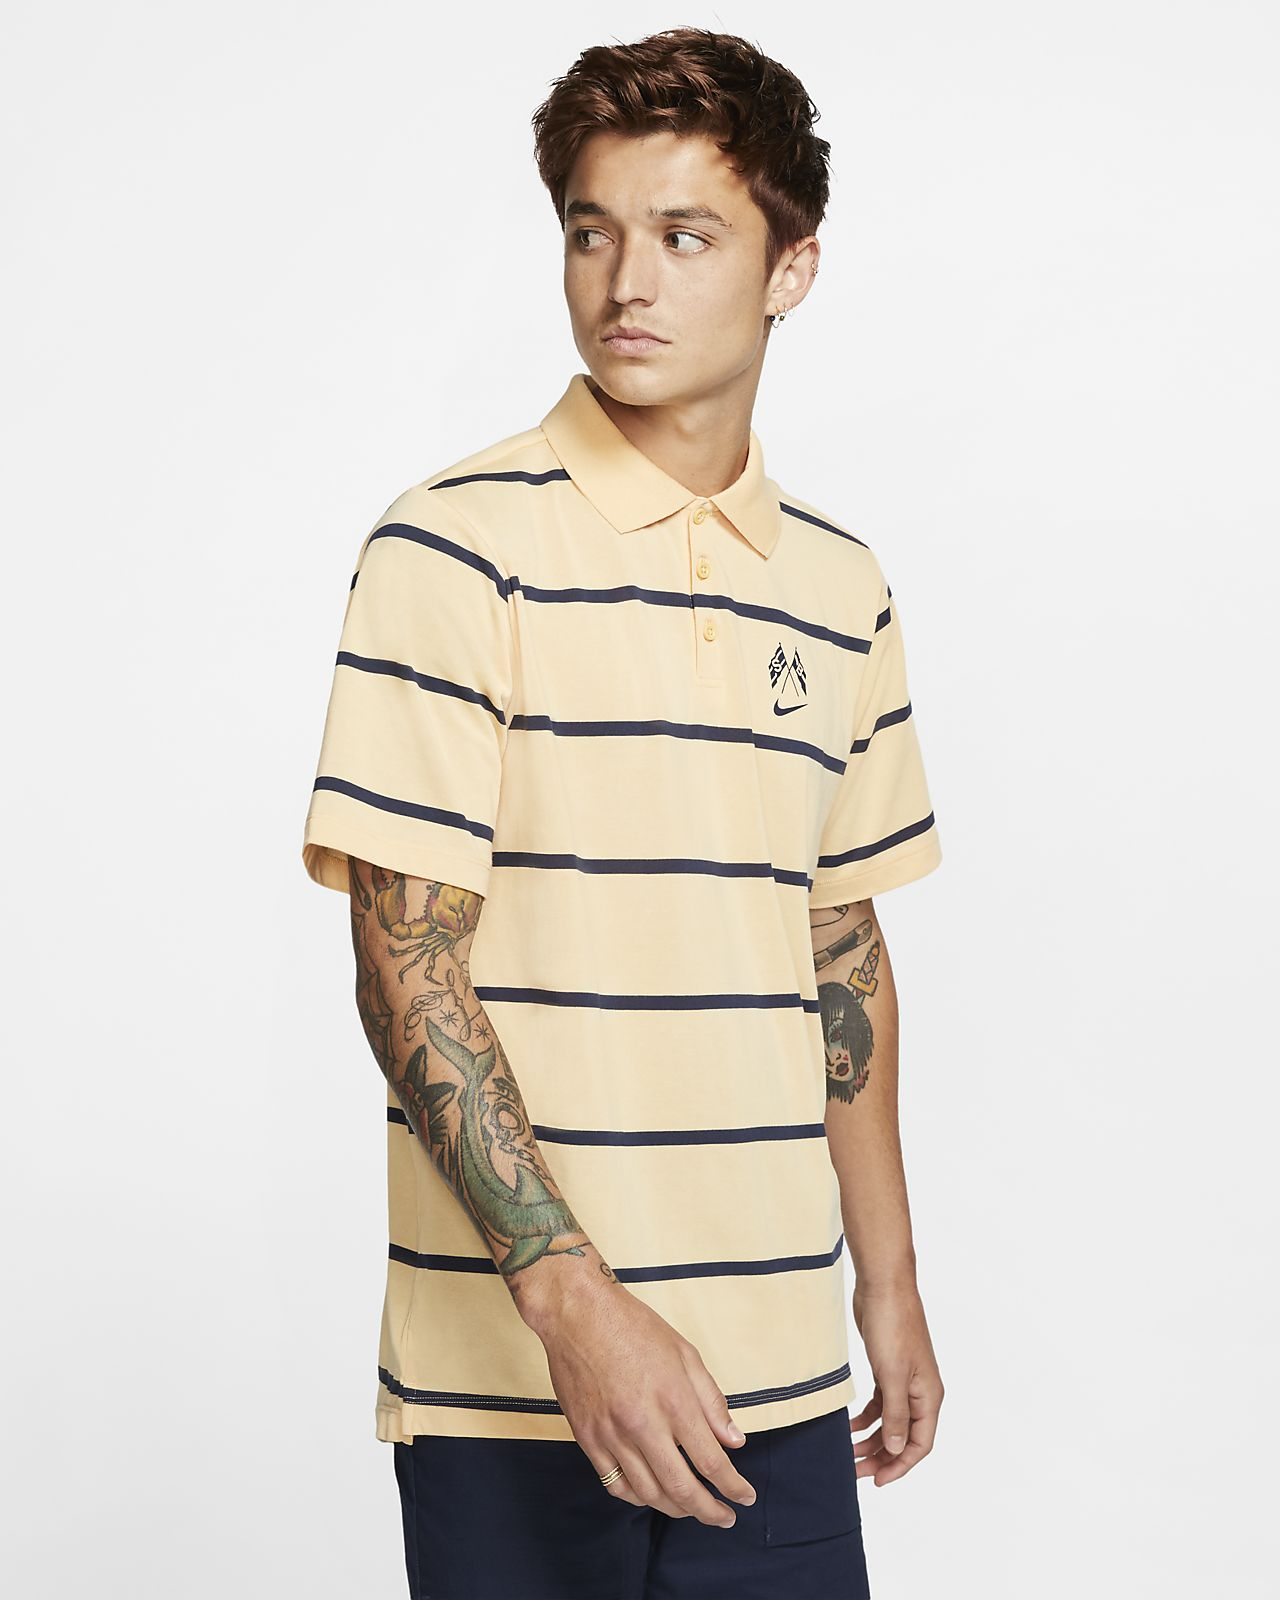 Nike SB Dri-FIT Skateboard-Poloshirt für Herren